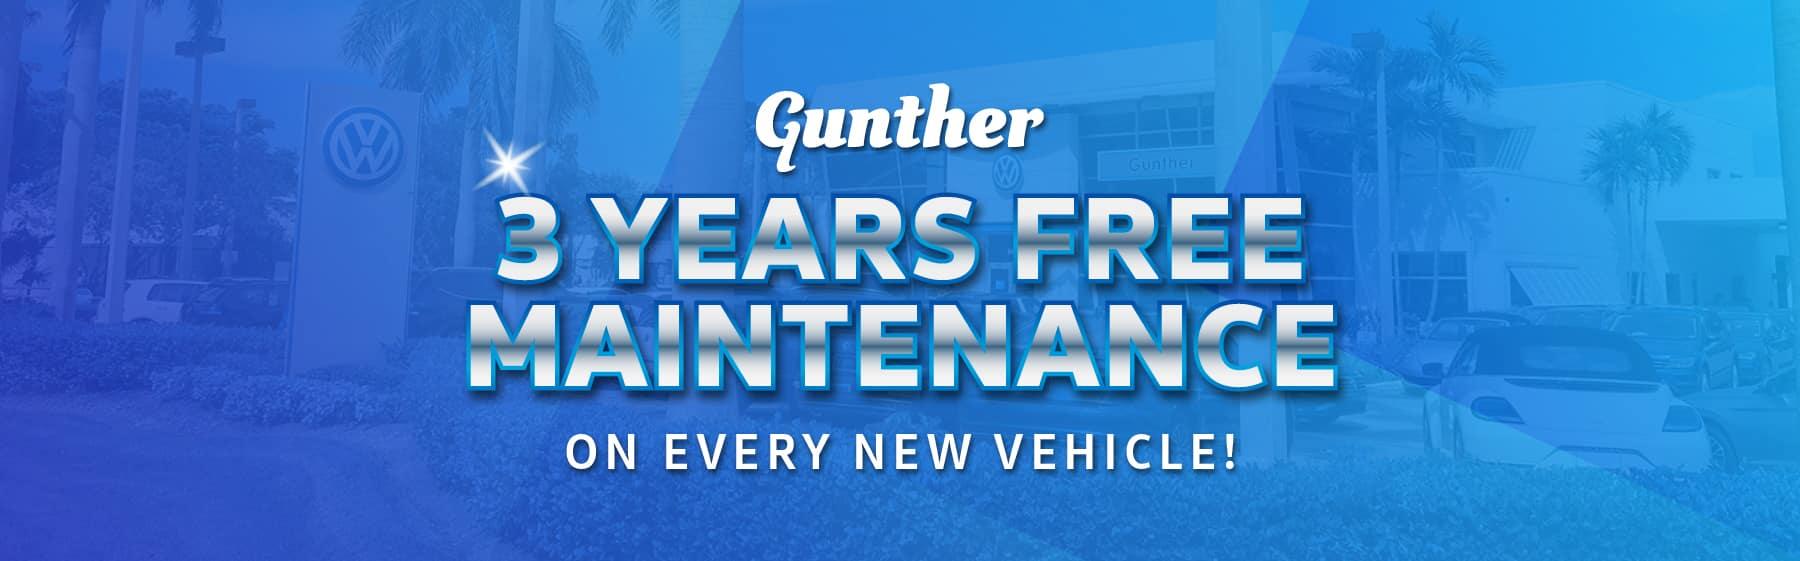 Gunther 3 years free maintenance on every new vehicle!